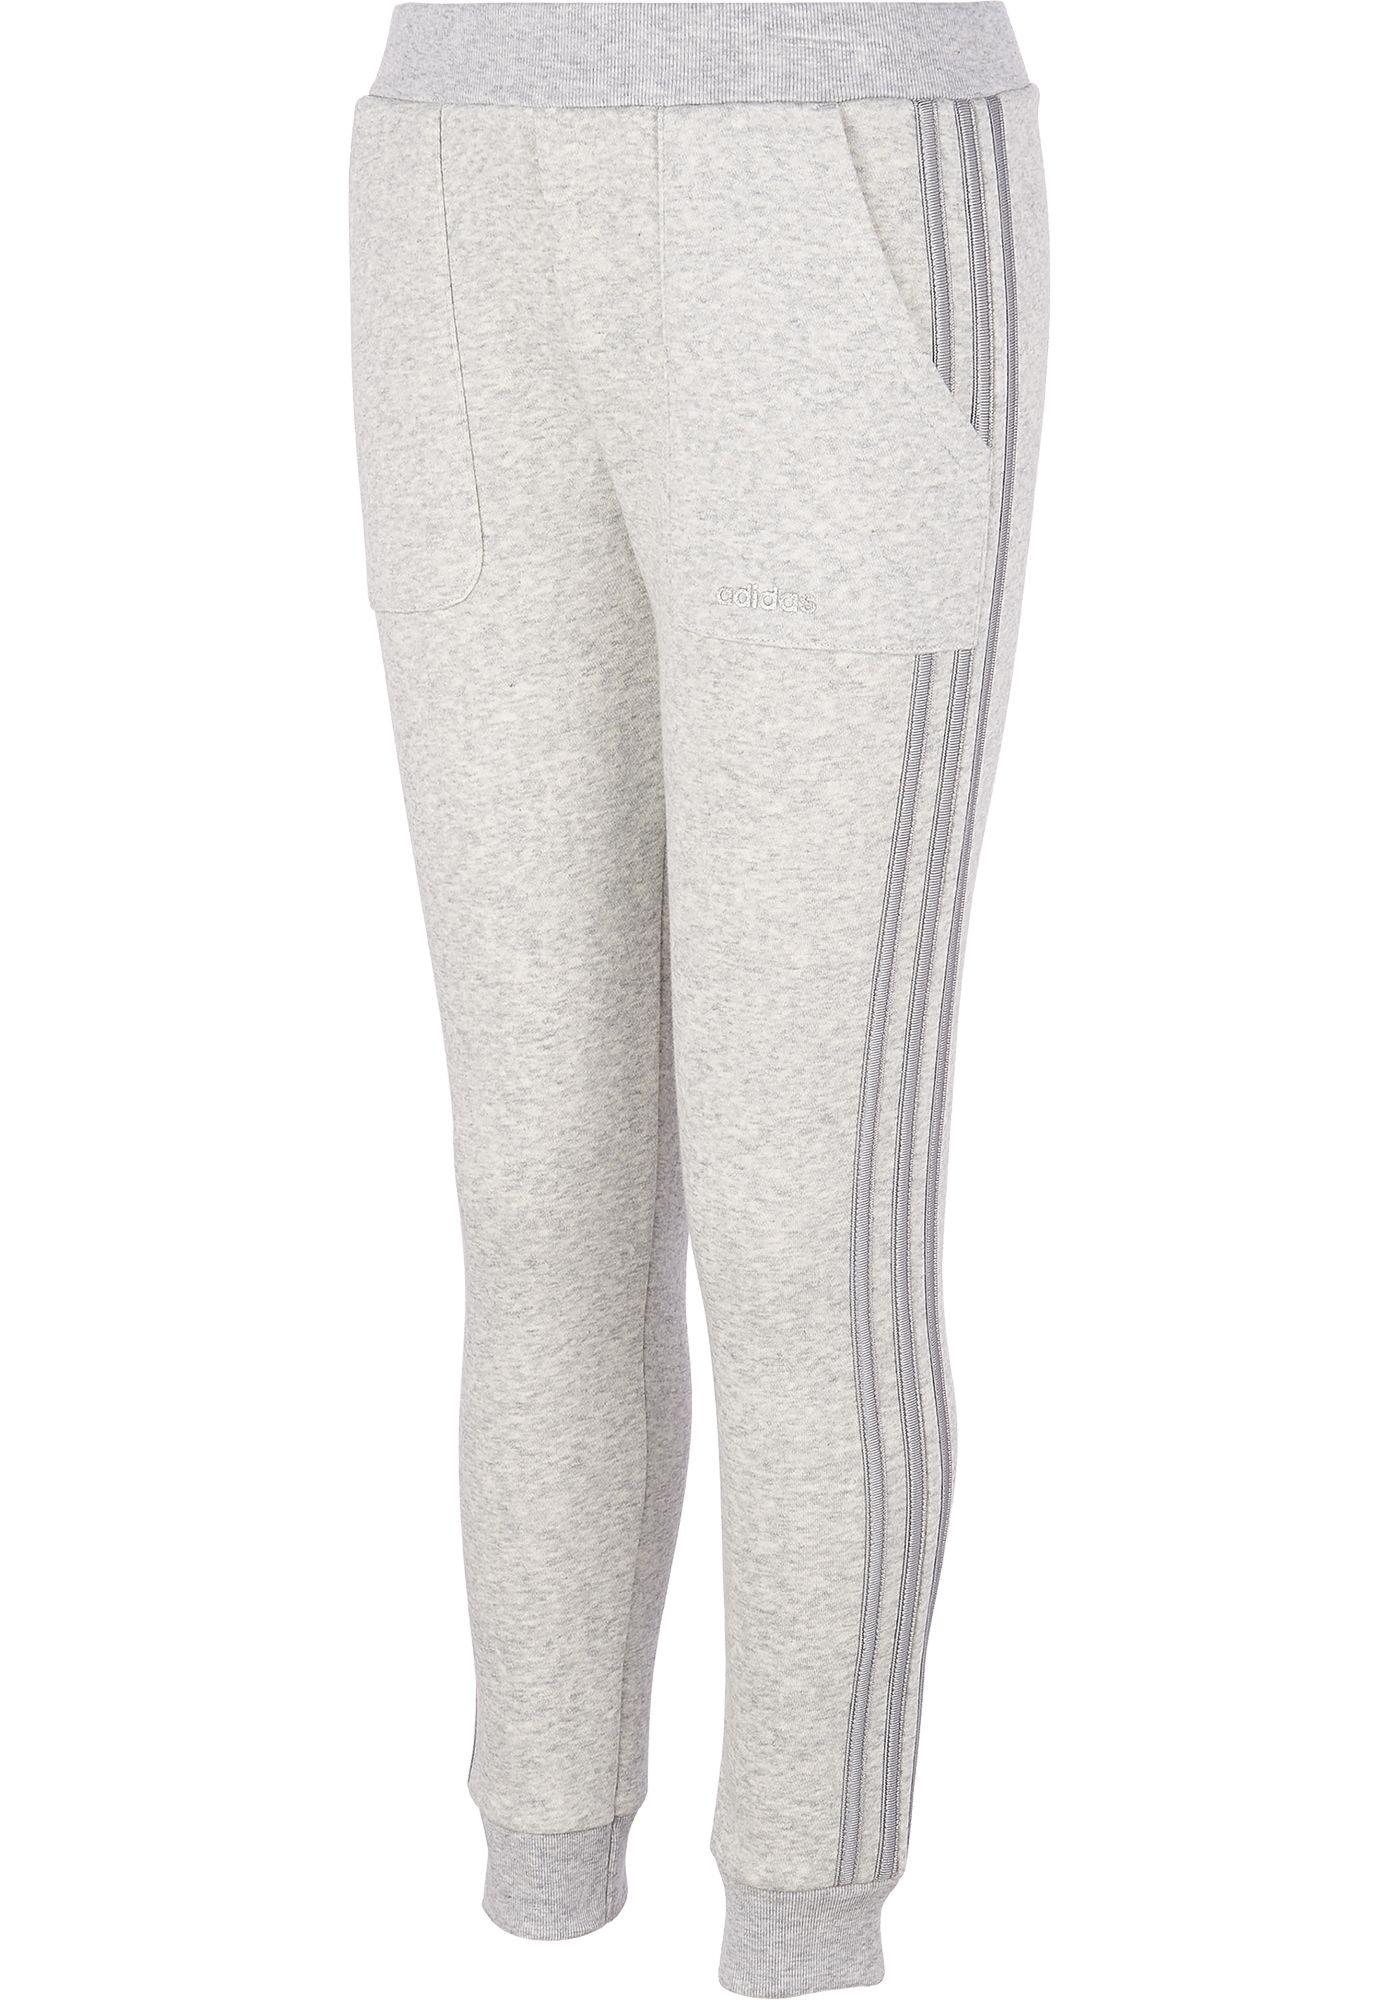 adidas Little Girls' Fleece Stripe Jogger Pants